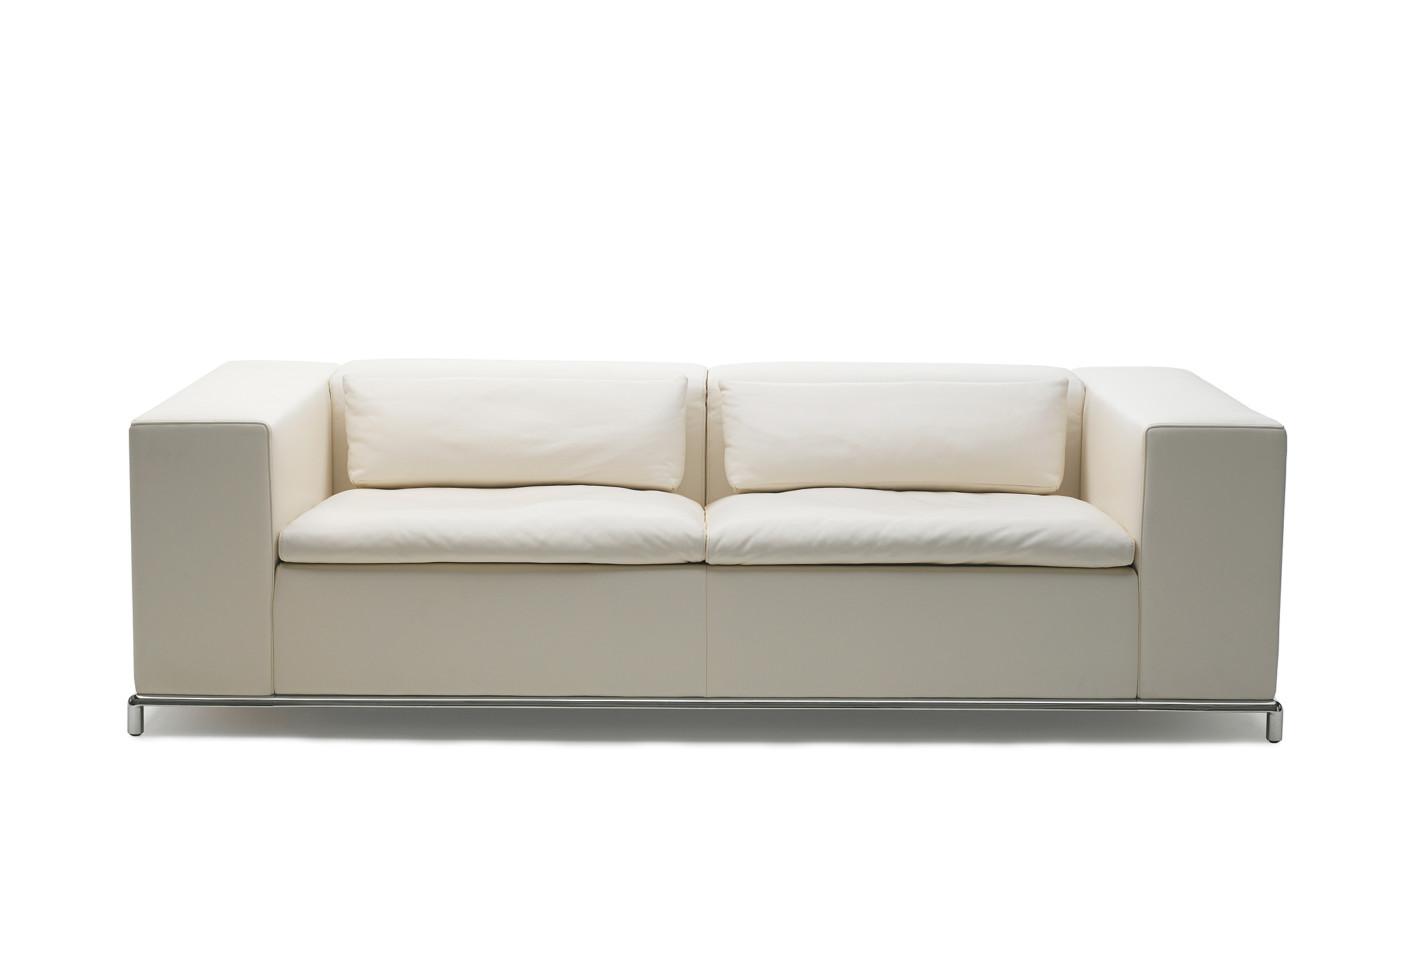 ds 7 sofa by de sede stylepark. Black Bedroom Furniture Sets. Home Design Ideas